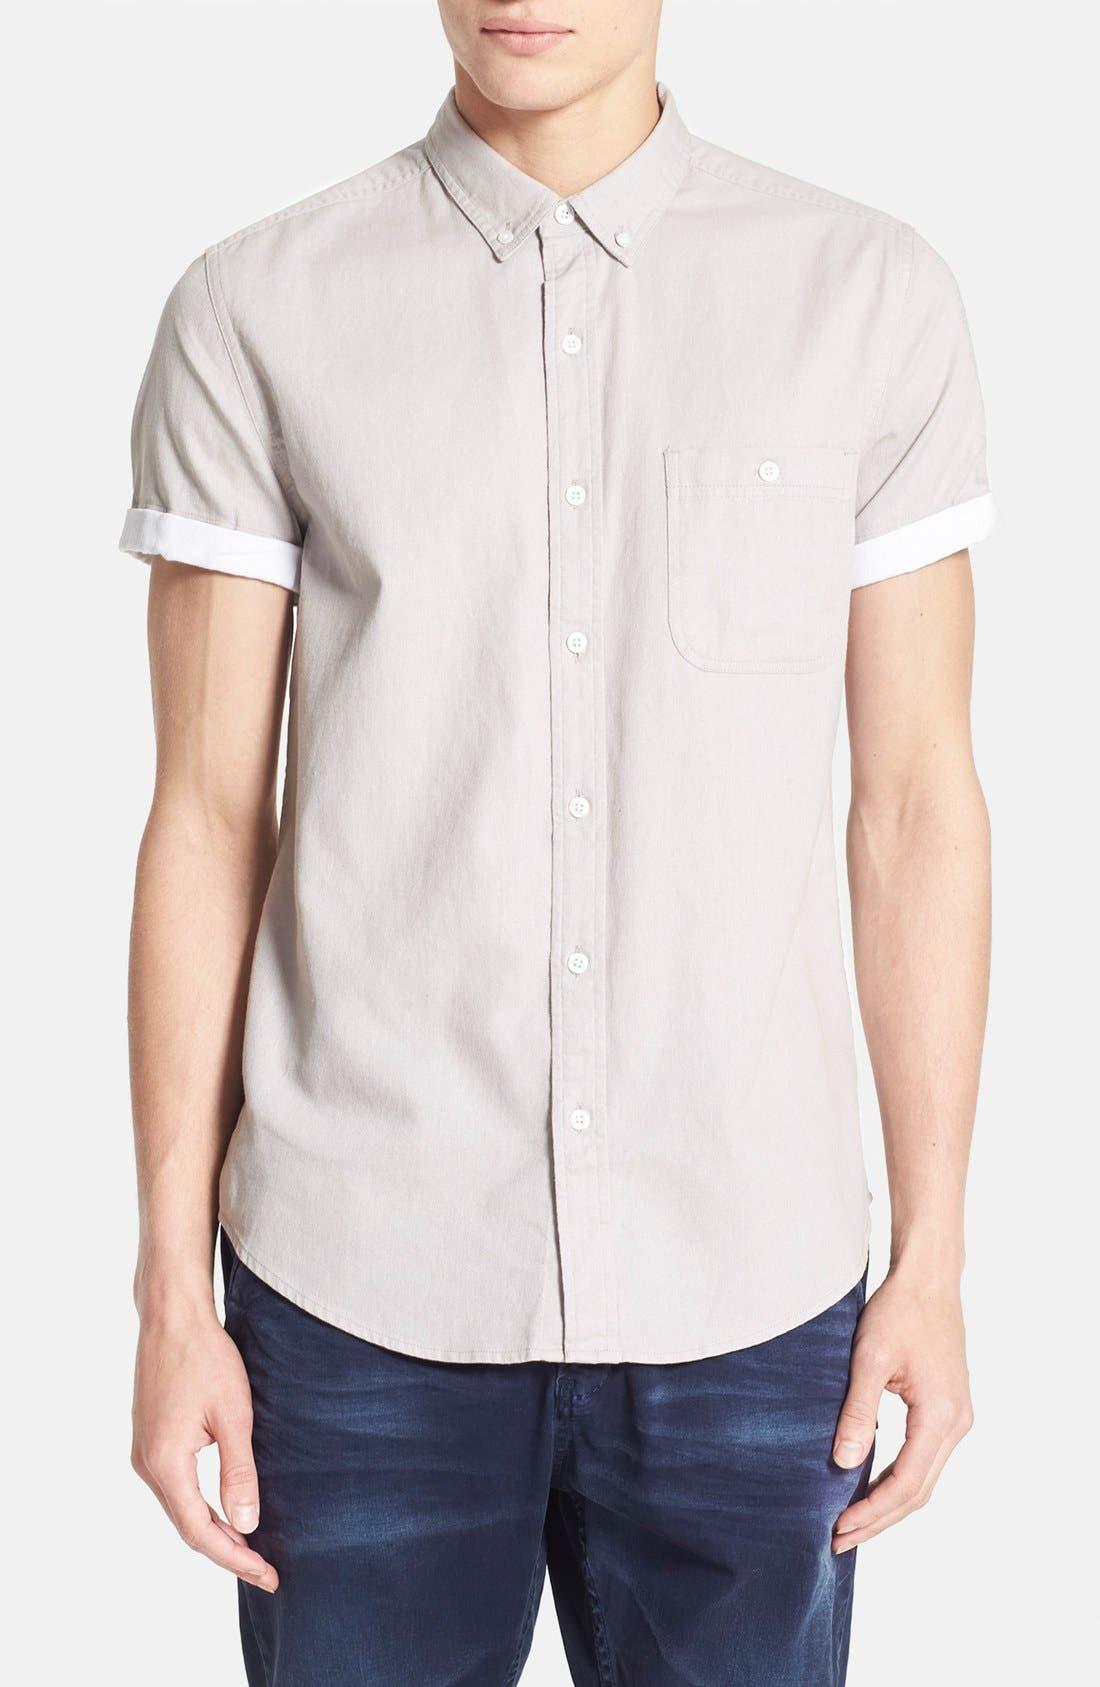 Main Image - Topman Contrast Trim Short Sleeve Cotton Shirt